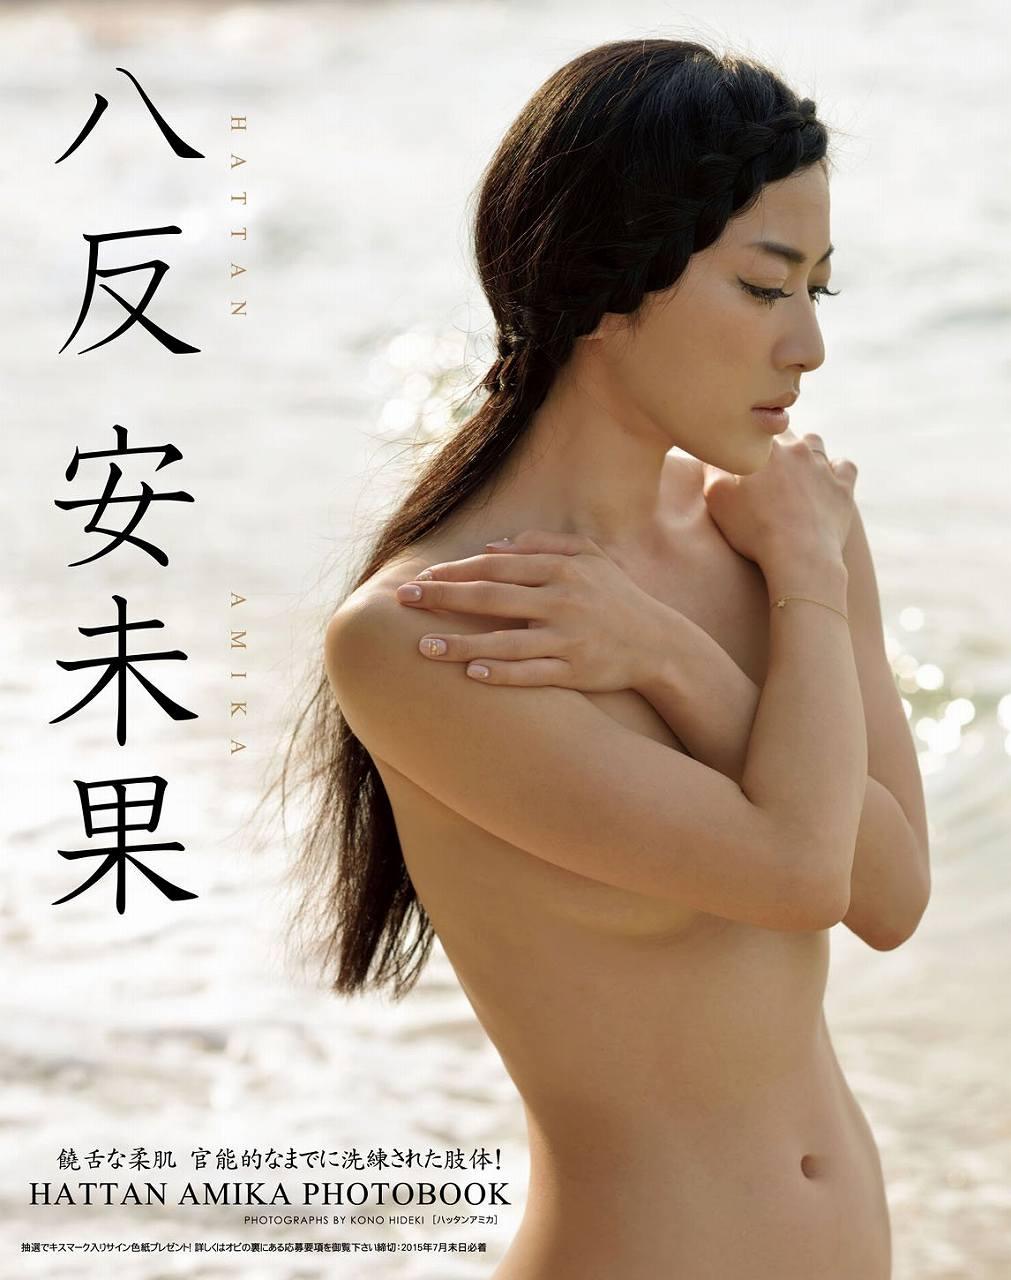 写真集「八反安未果 HATTAN AMIKA PHOTOBOOK」の表紙